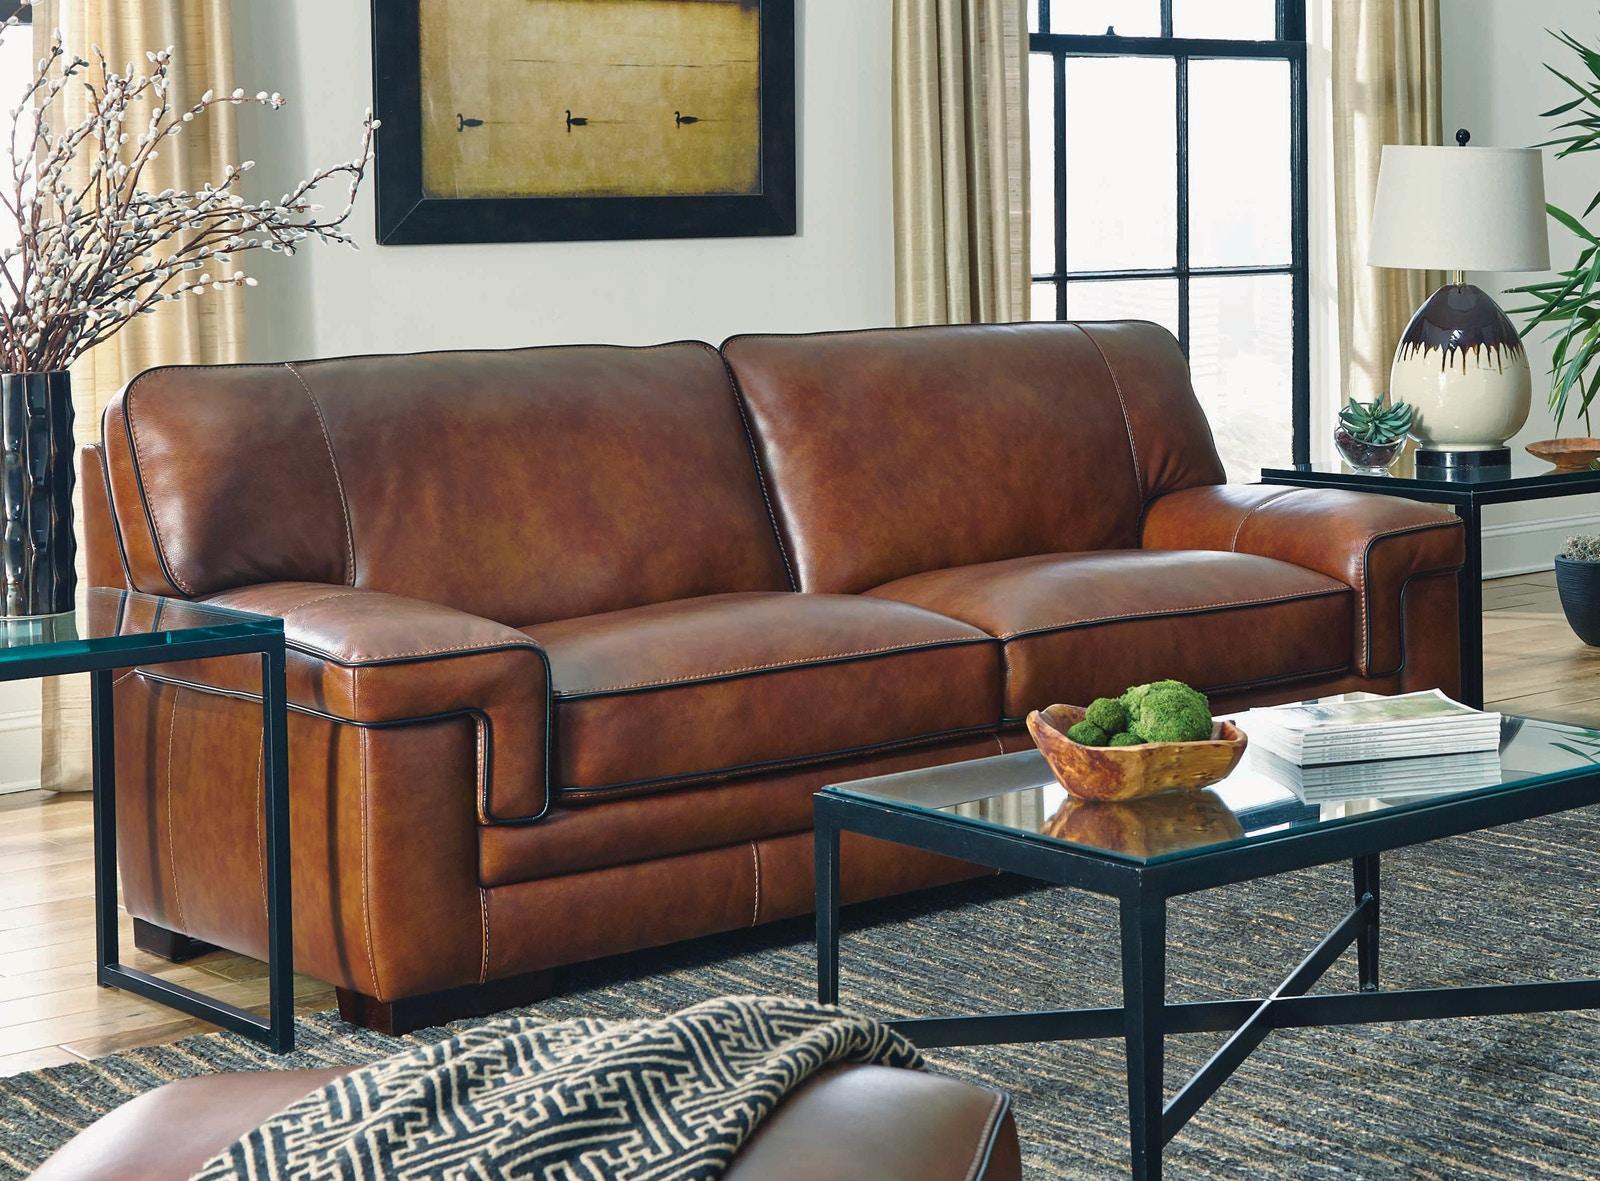 044358. Chestnut Leather Sofa